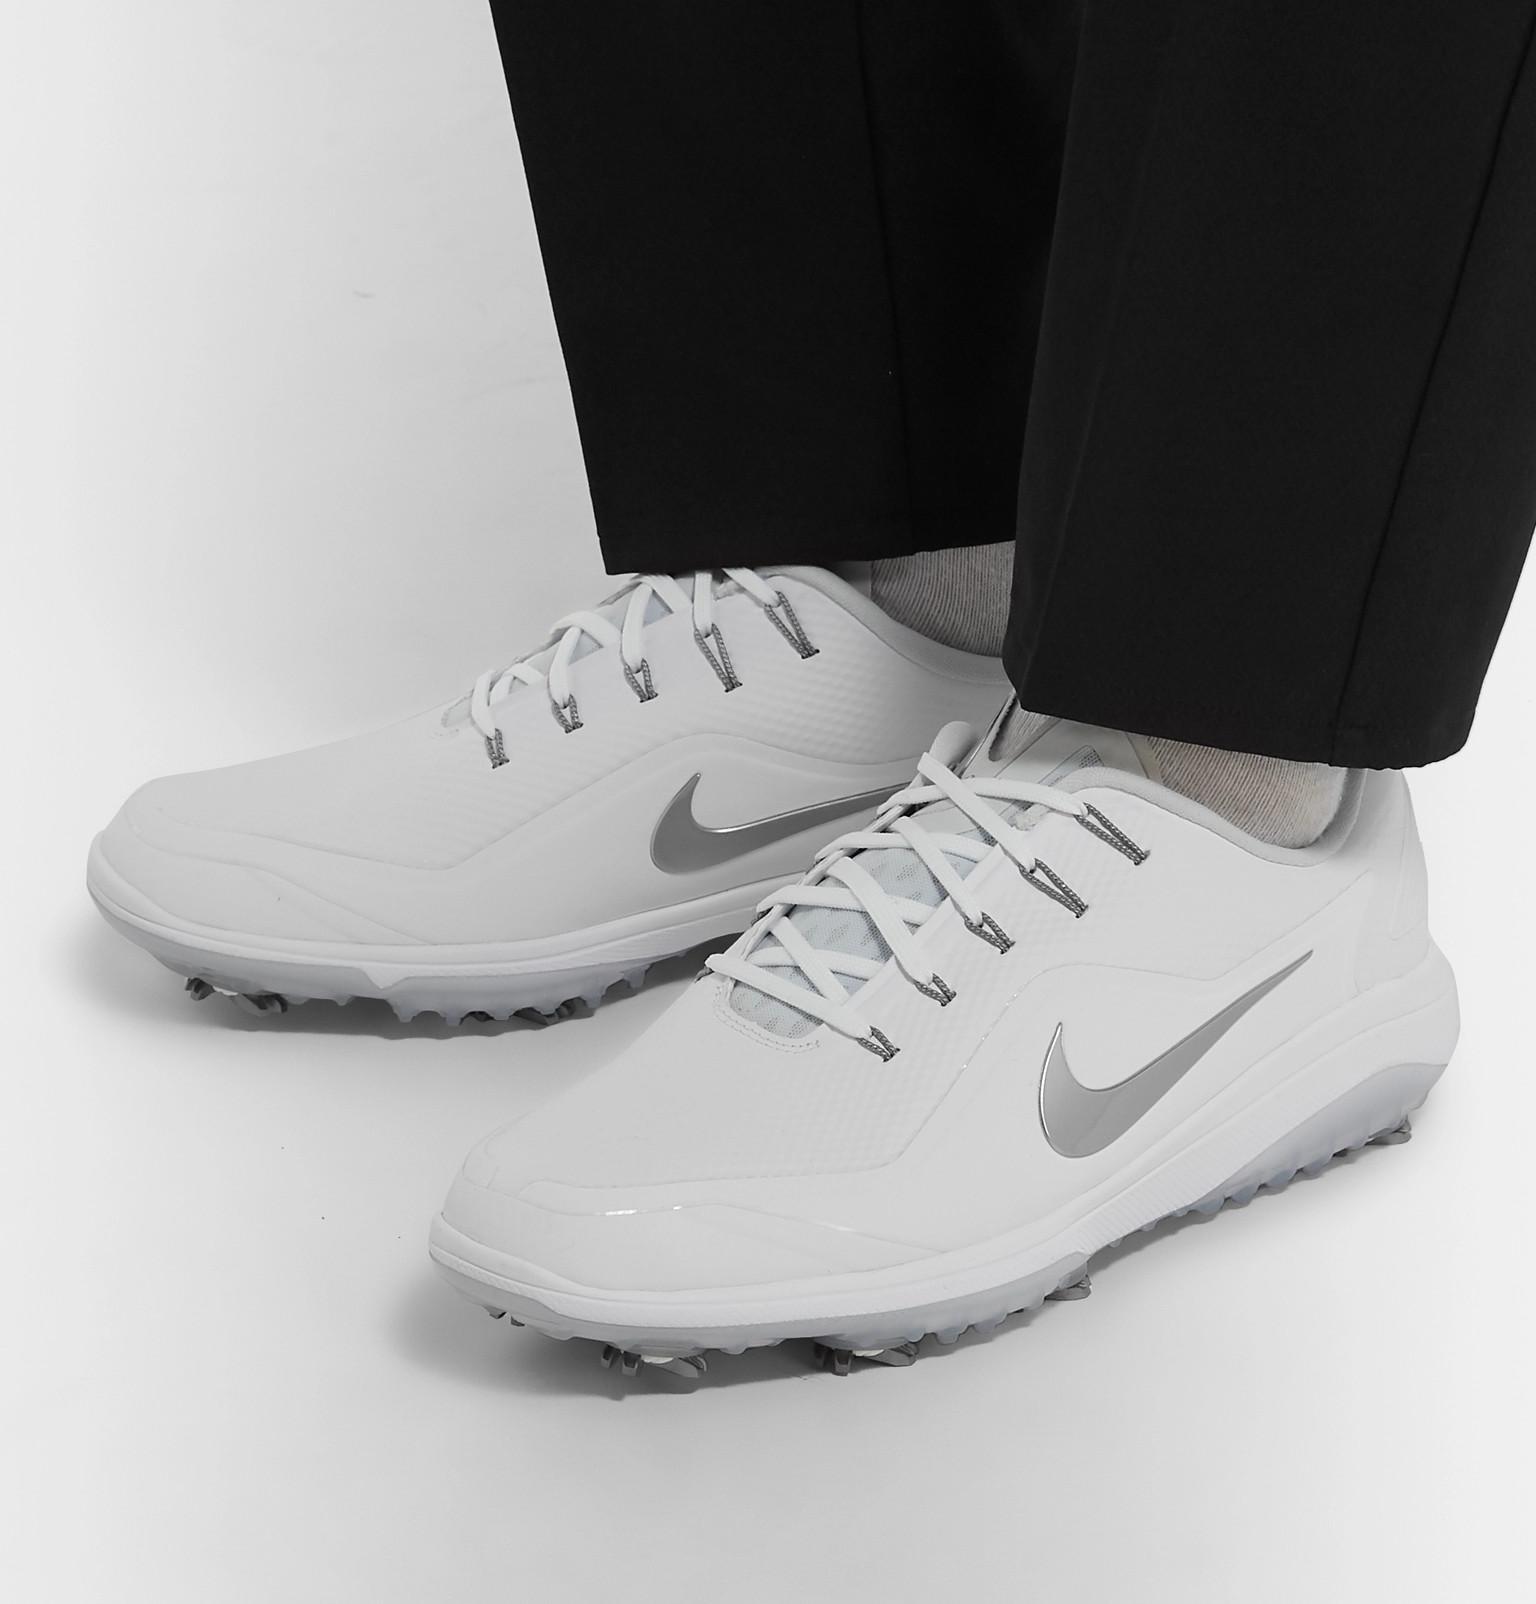 056339e6cab Nike - White React Vapor 2 Coated-mesh Golf Shoes for Men - Lyst. View  fullscreen